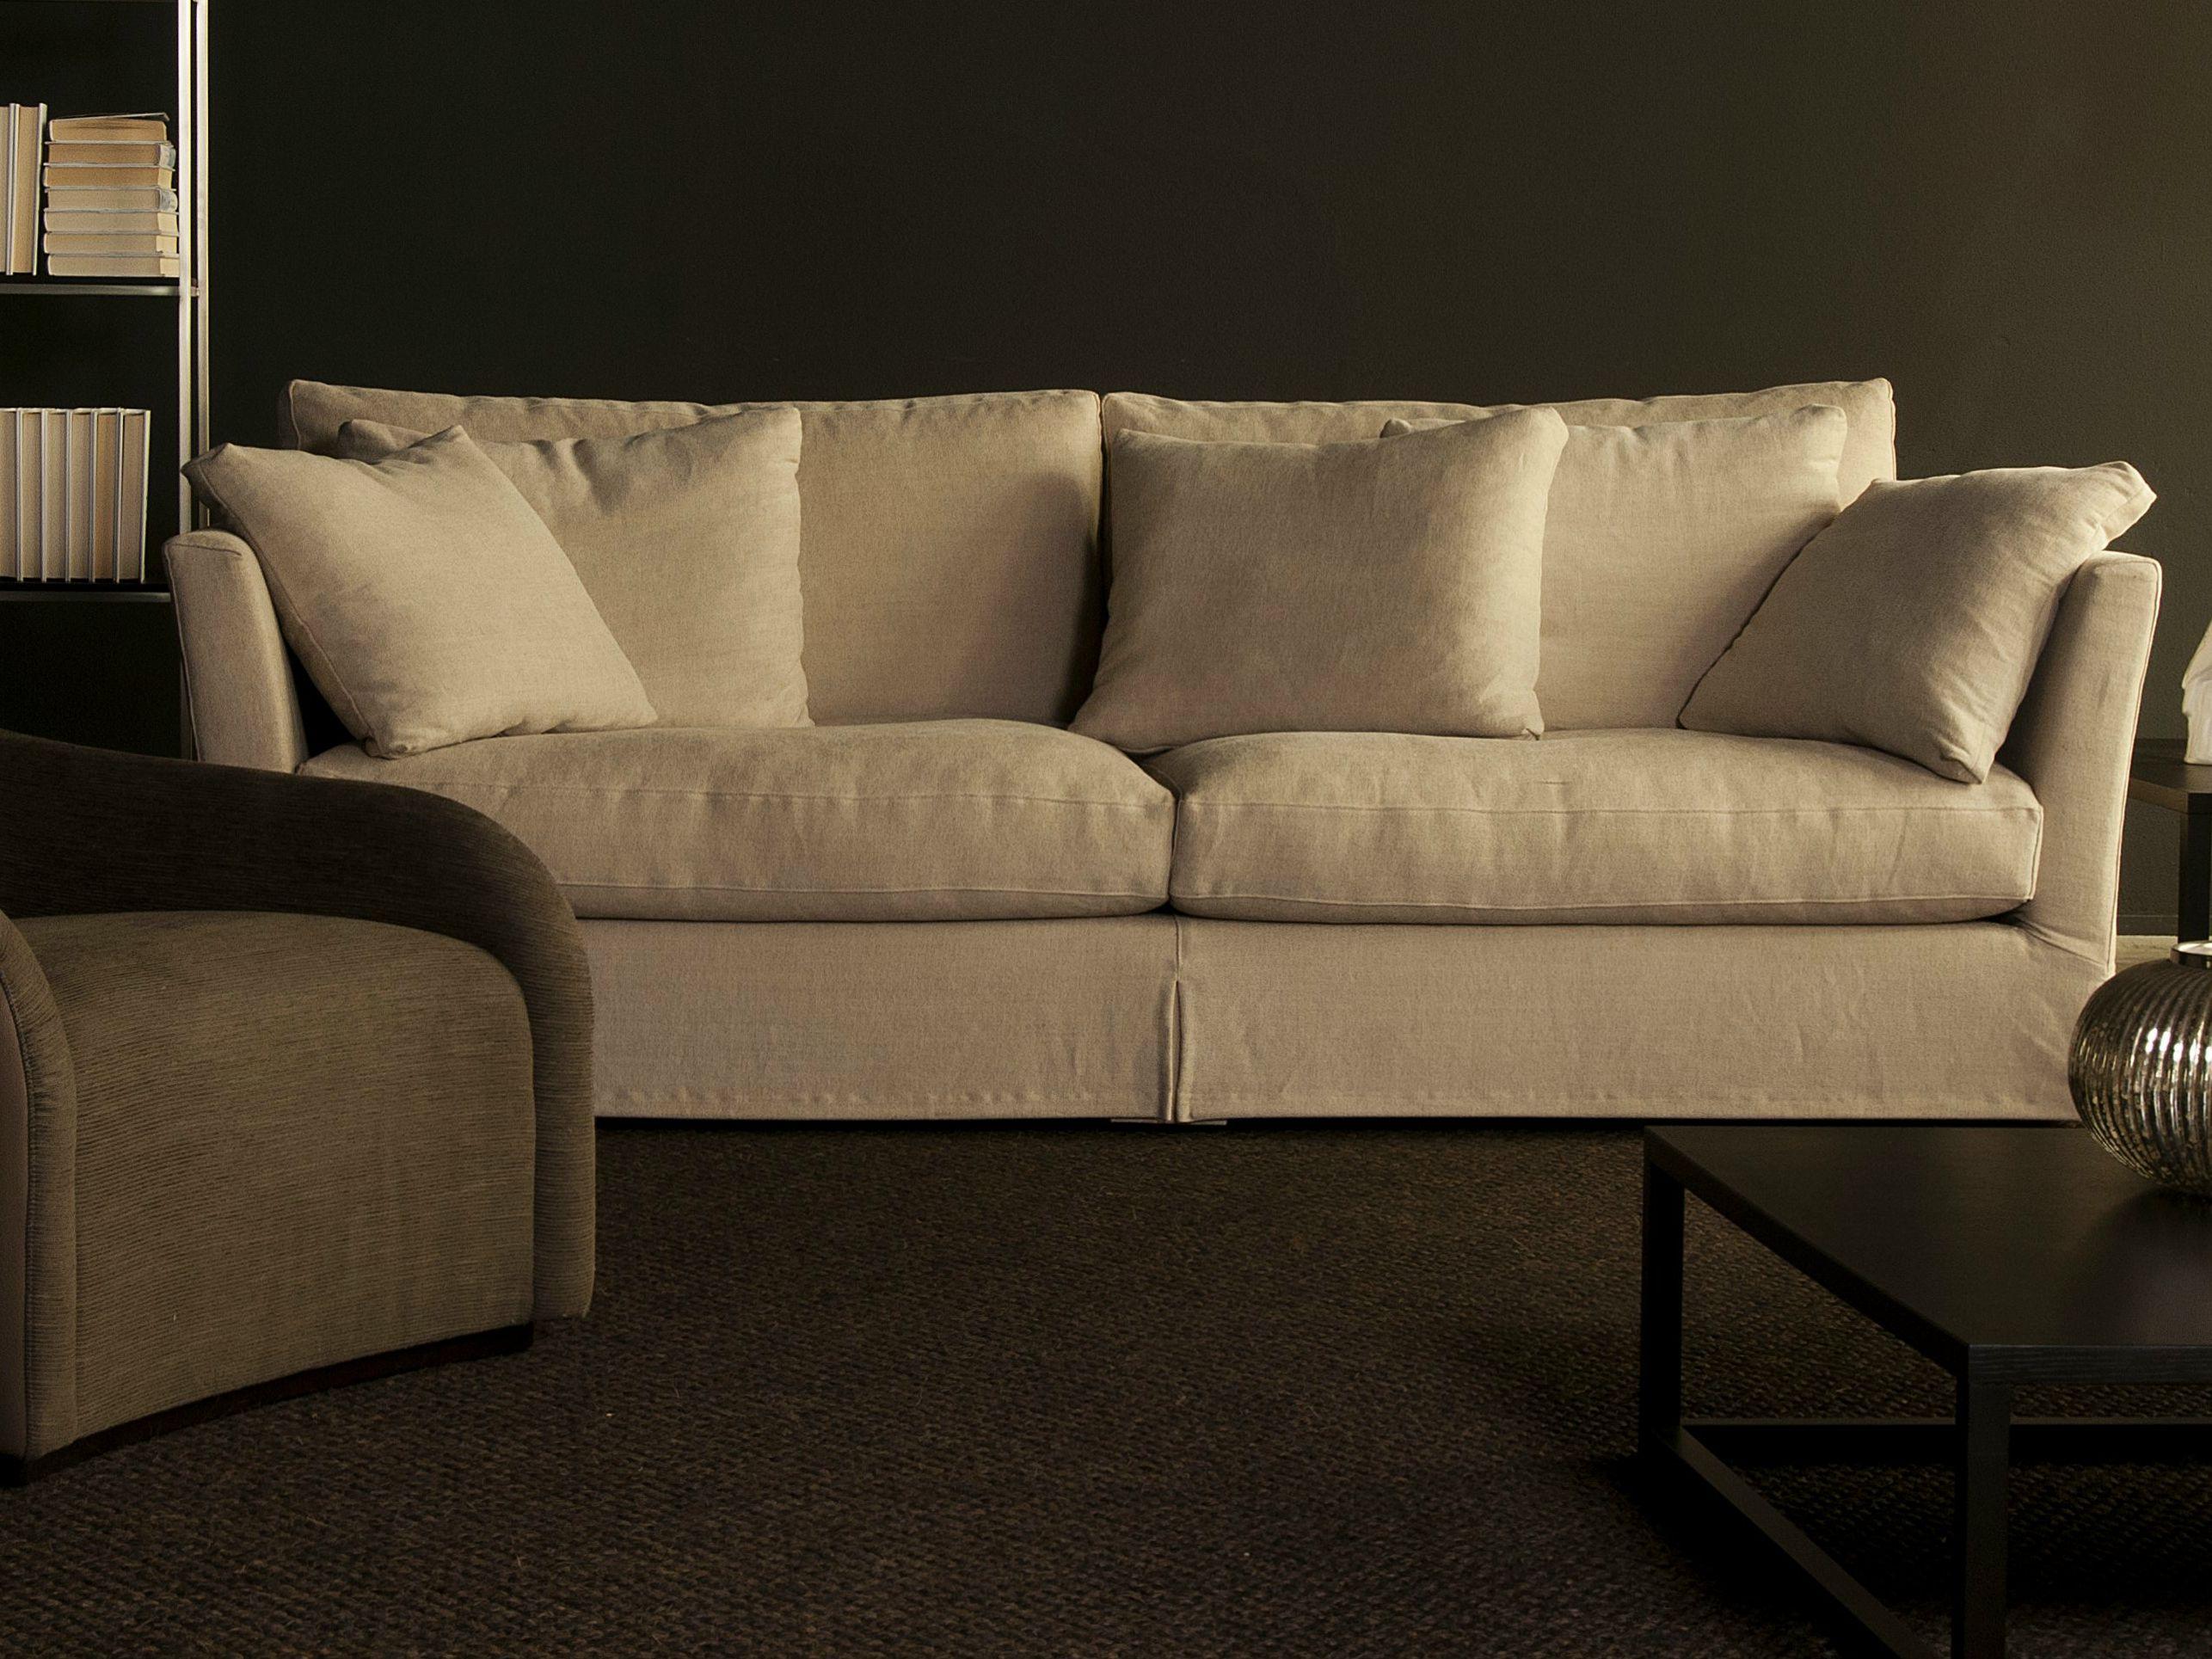 Sof composable modular de tela bellagio by giulio marelli - Telas para cubrir sofa ...